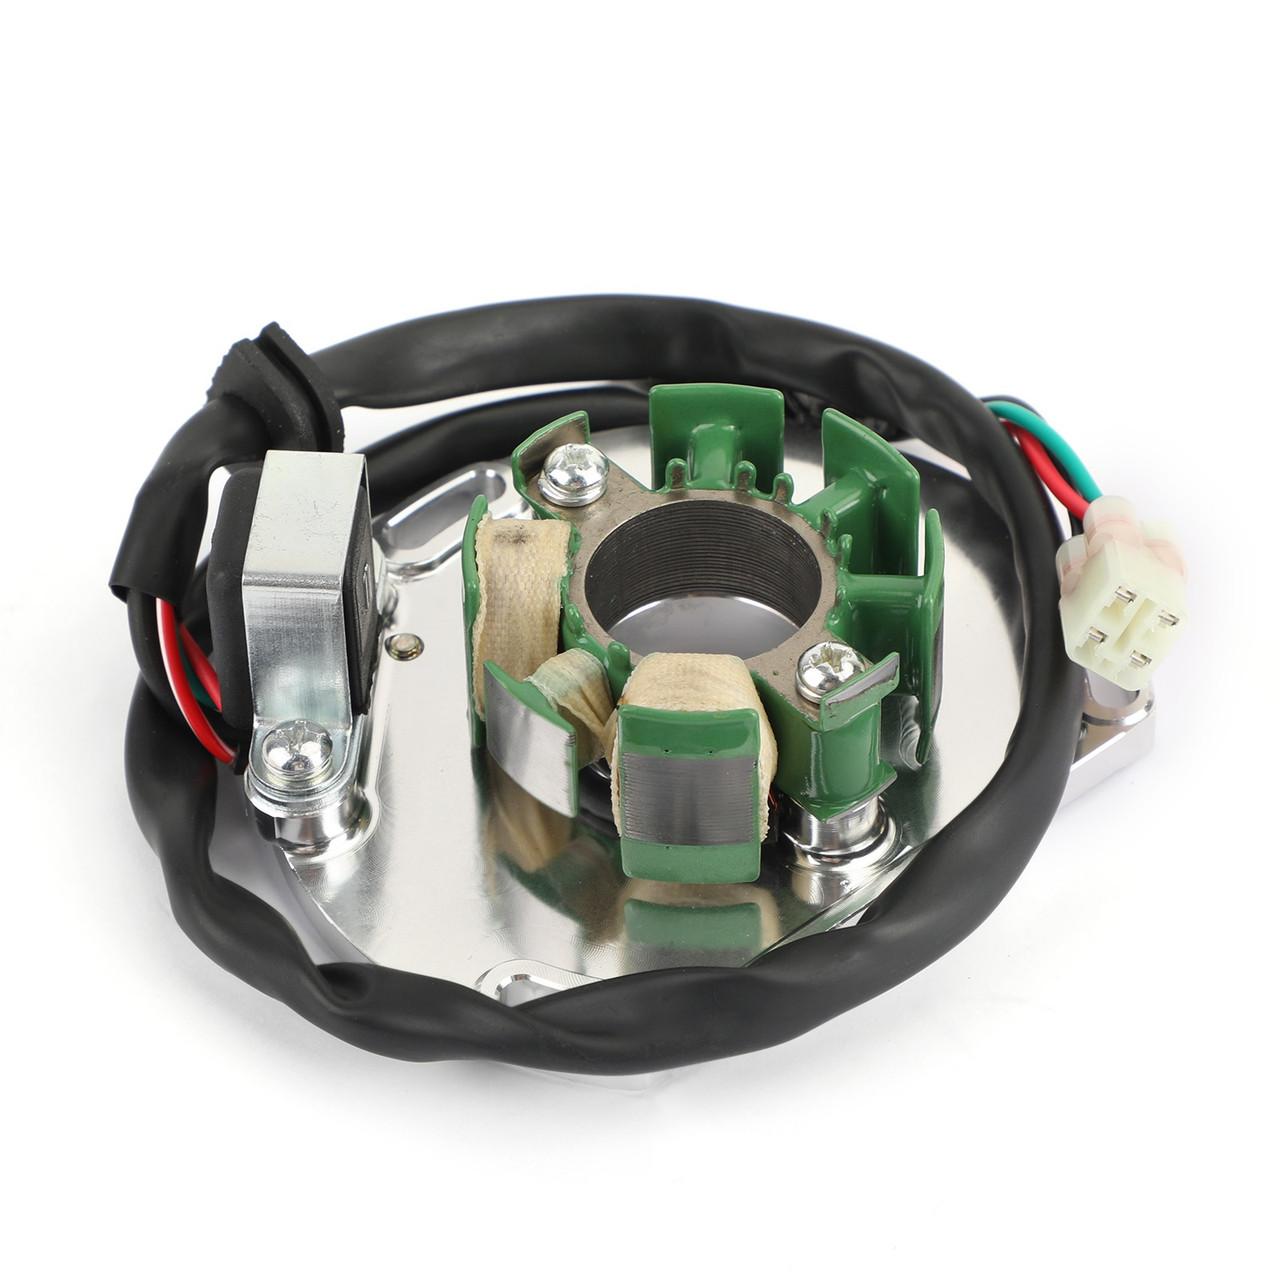 Magneto Generator Engine Stator 2K-1 Fit For 125/144/150/250 SX SXS TC 04-15